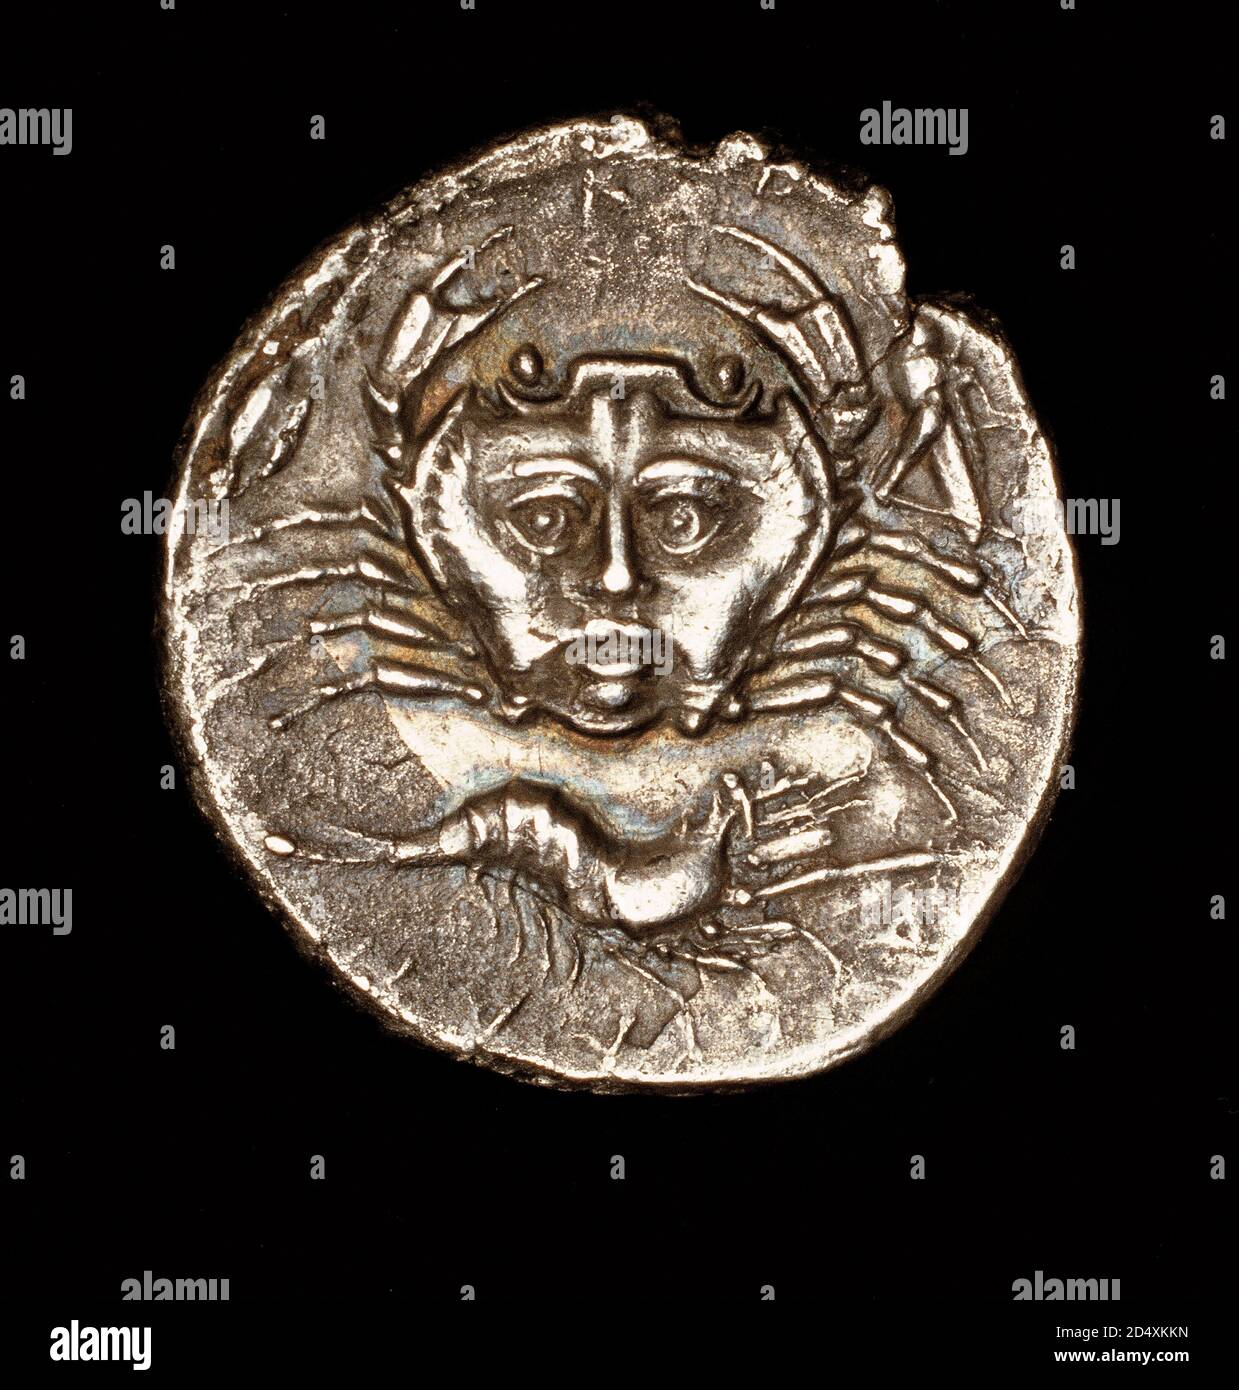 Moneda griega antigua rara, Sicilia, Catana, Drachma Plata, Amenanos, cangrejo con cara y Pawn, c 420 AC Foto de stock